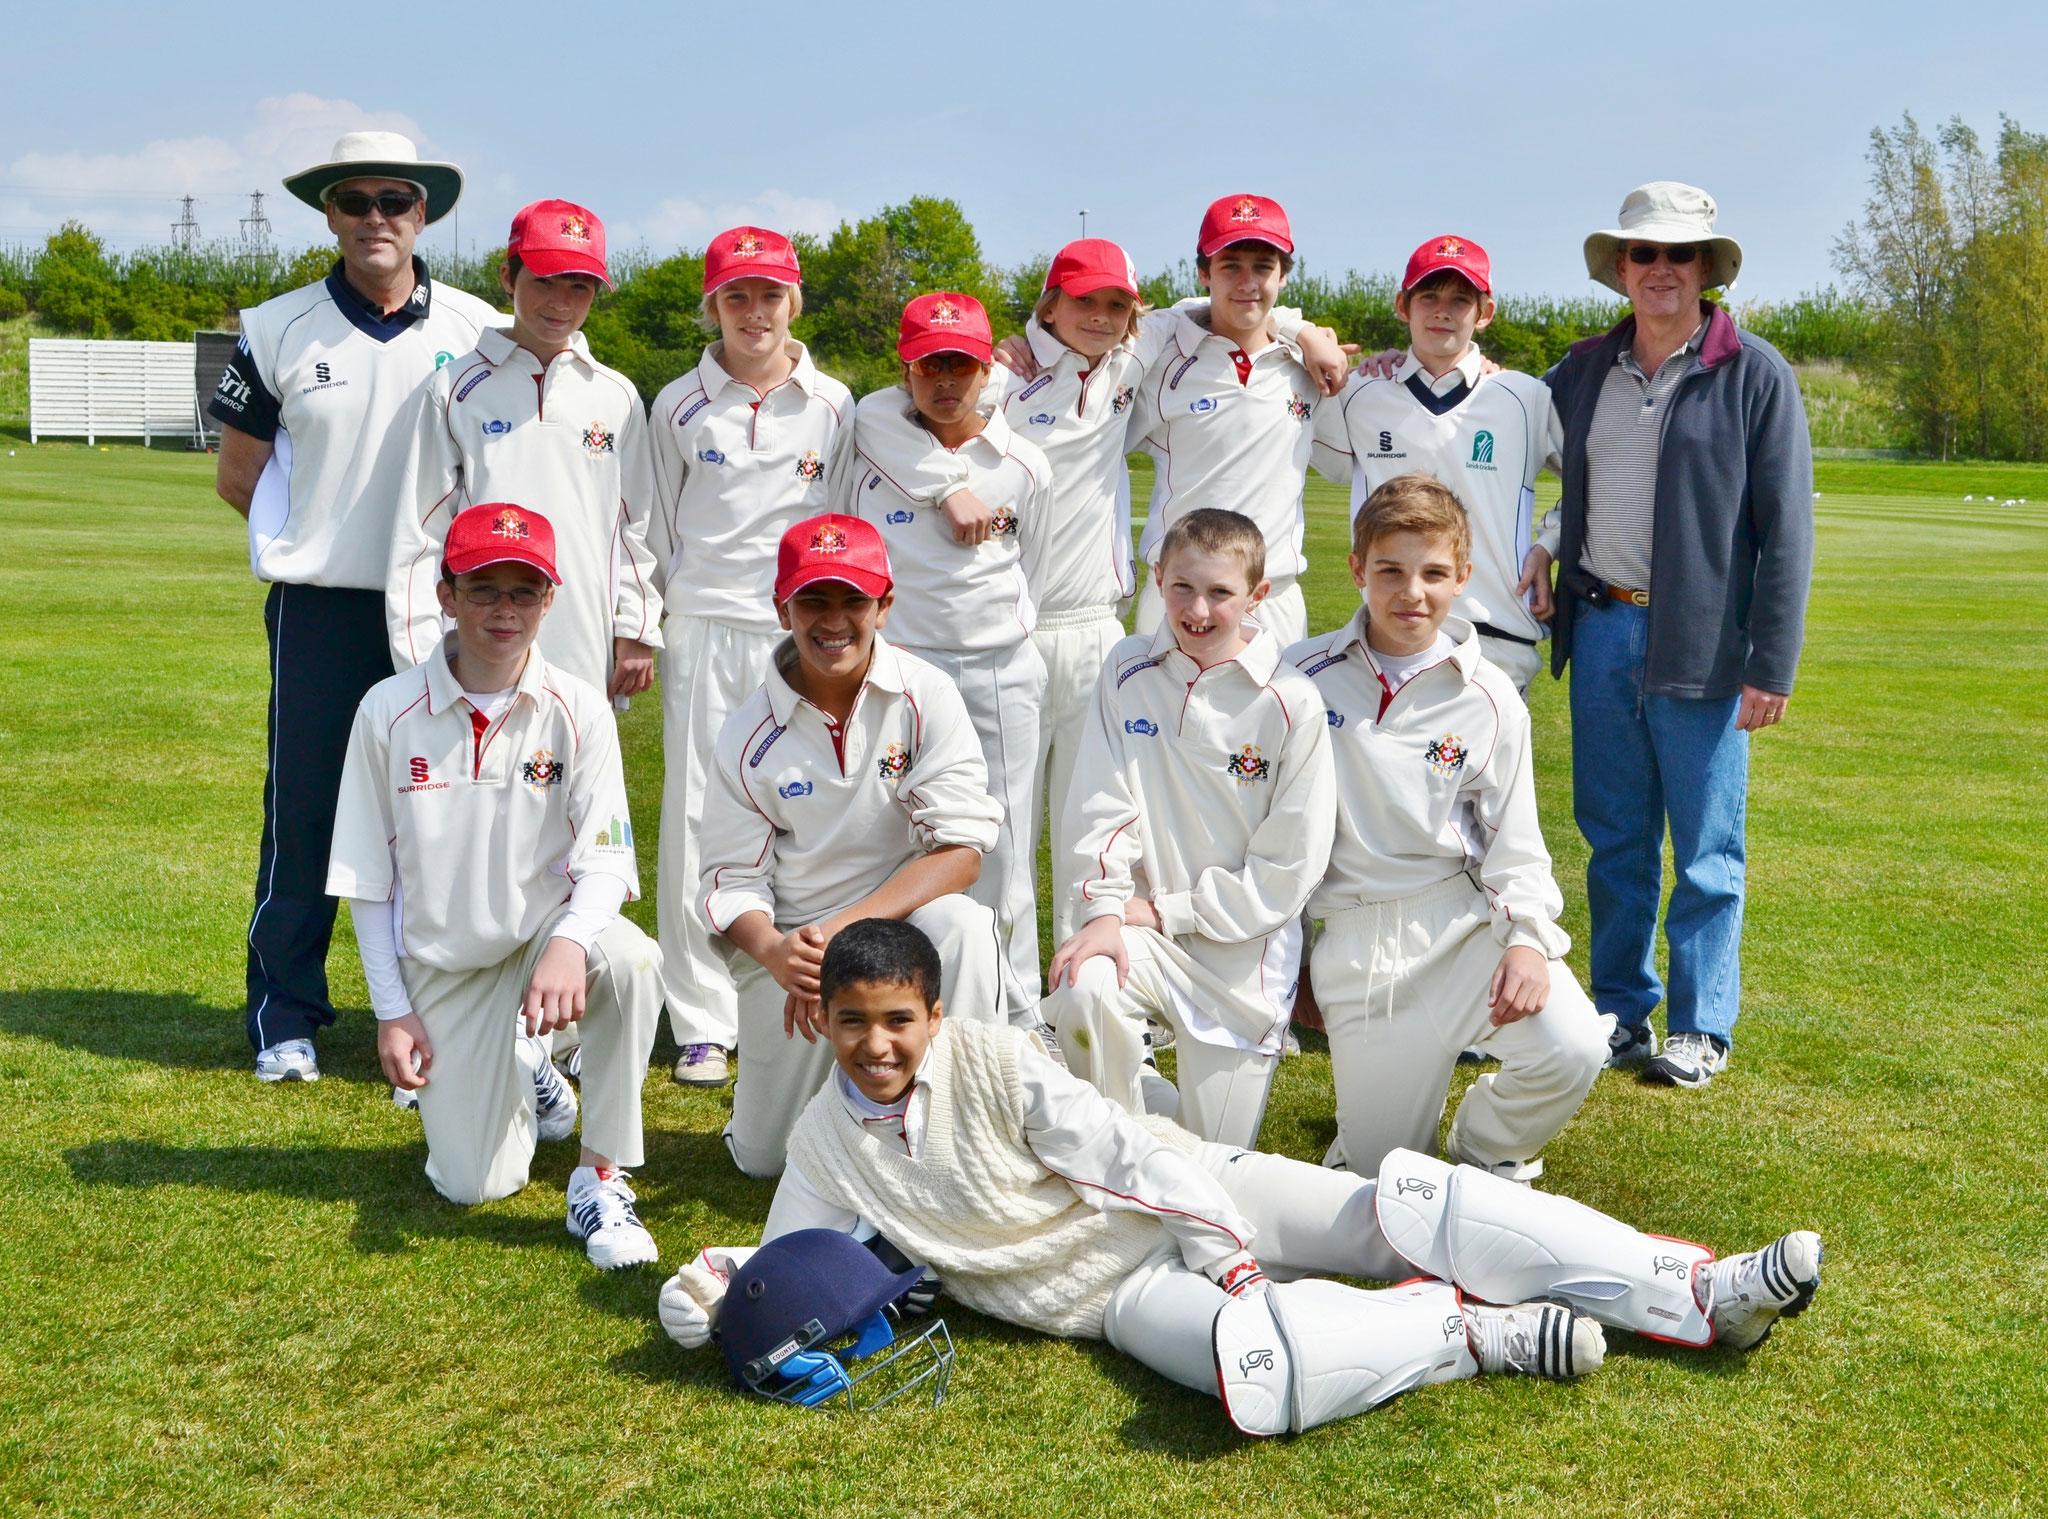 Swiss Under 13s in Denmark 2012